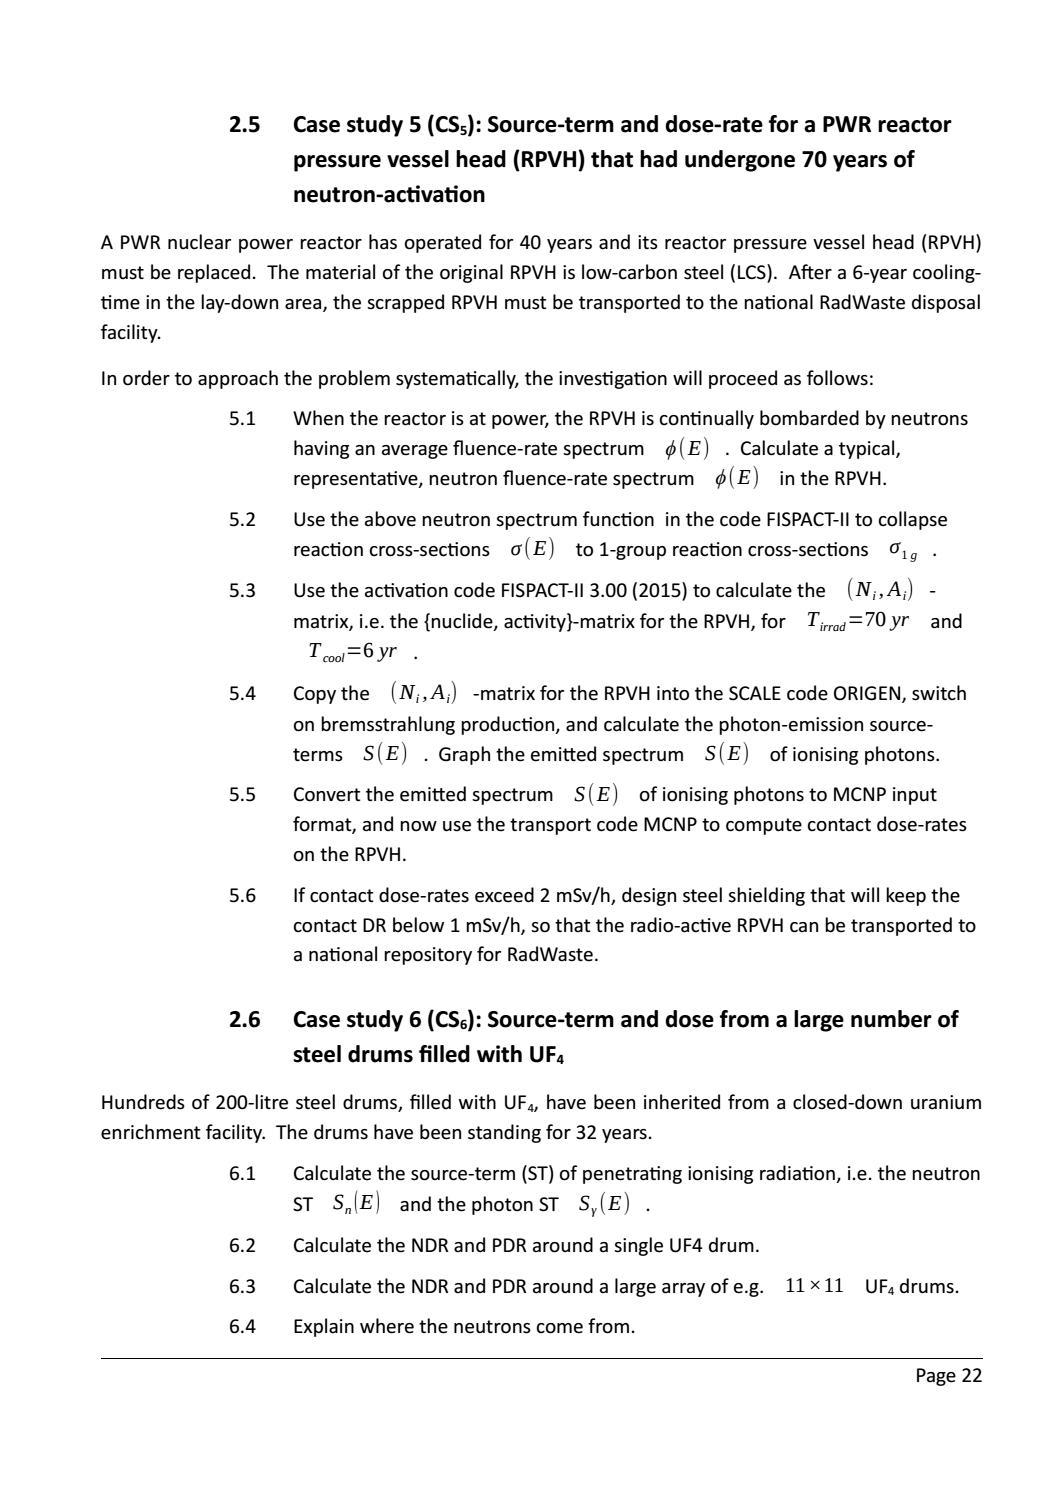 RADIOACTIVE WASTE: COMPUTATIONAL CHARACTERISATION and SHIELDING page 47